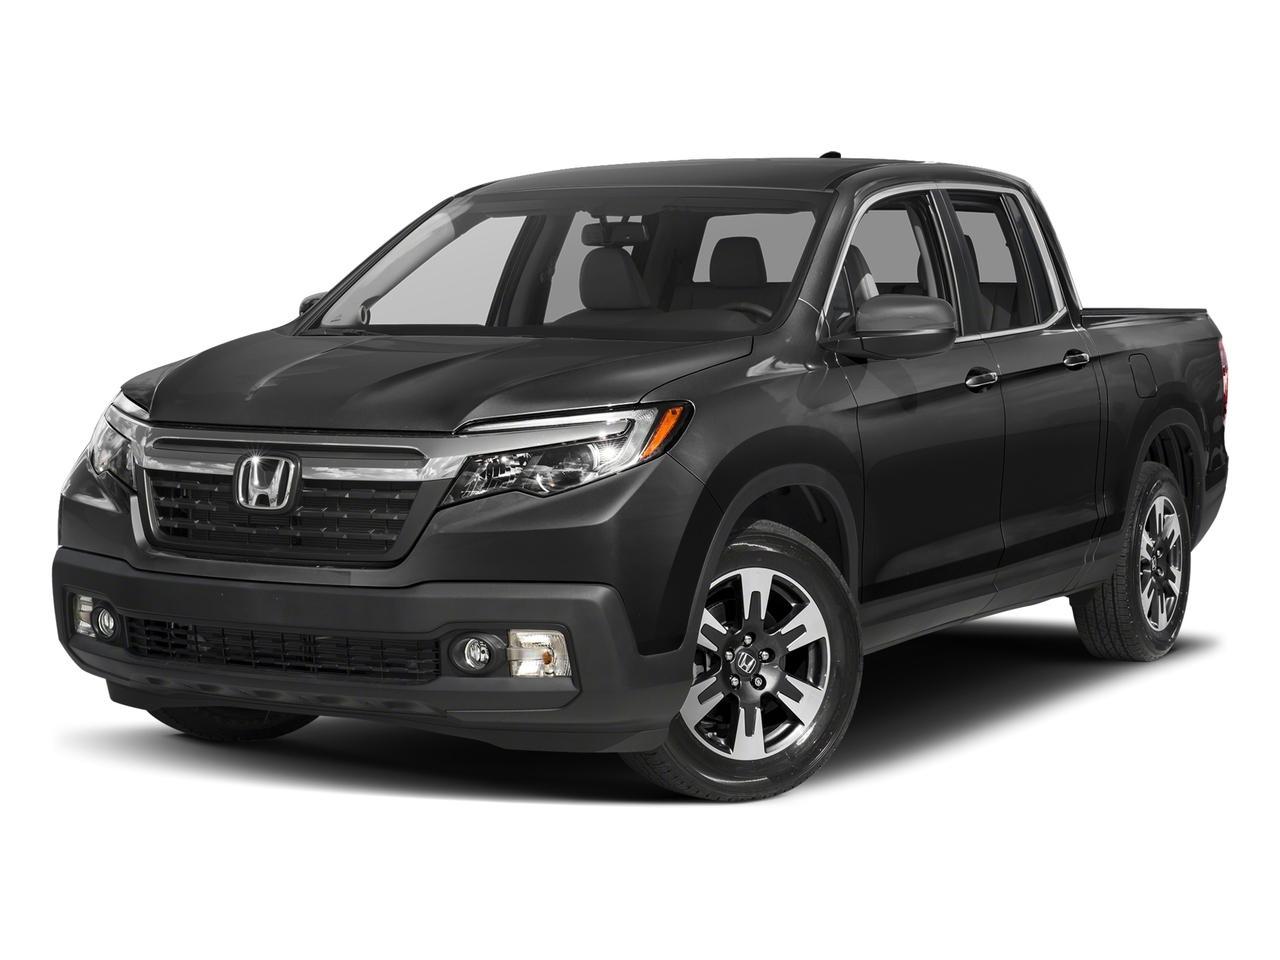 2017 Honda Ridgeline Vehicle Photo in San Antonio, TX 78238